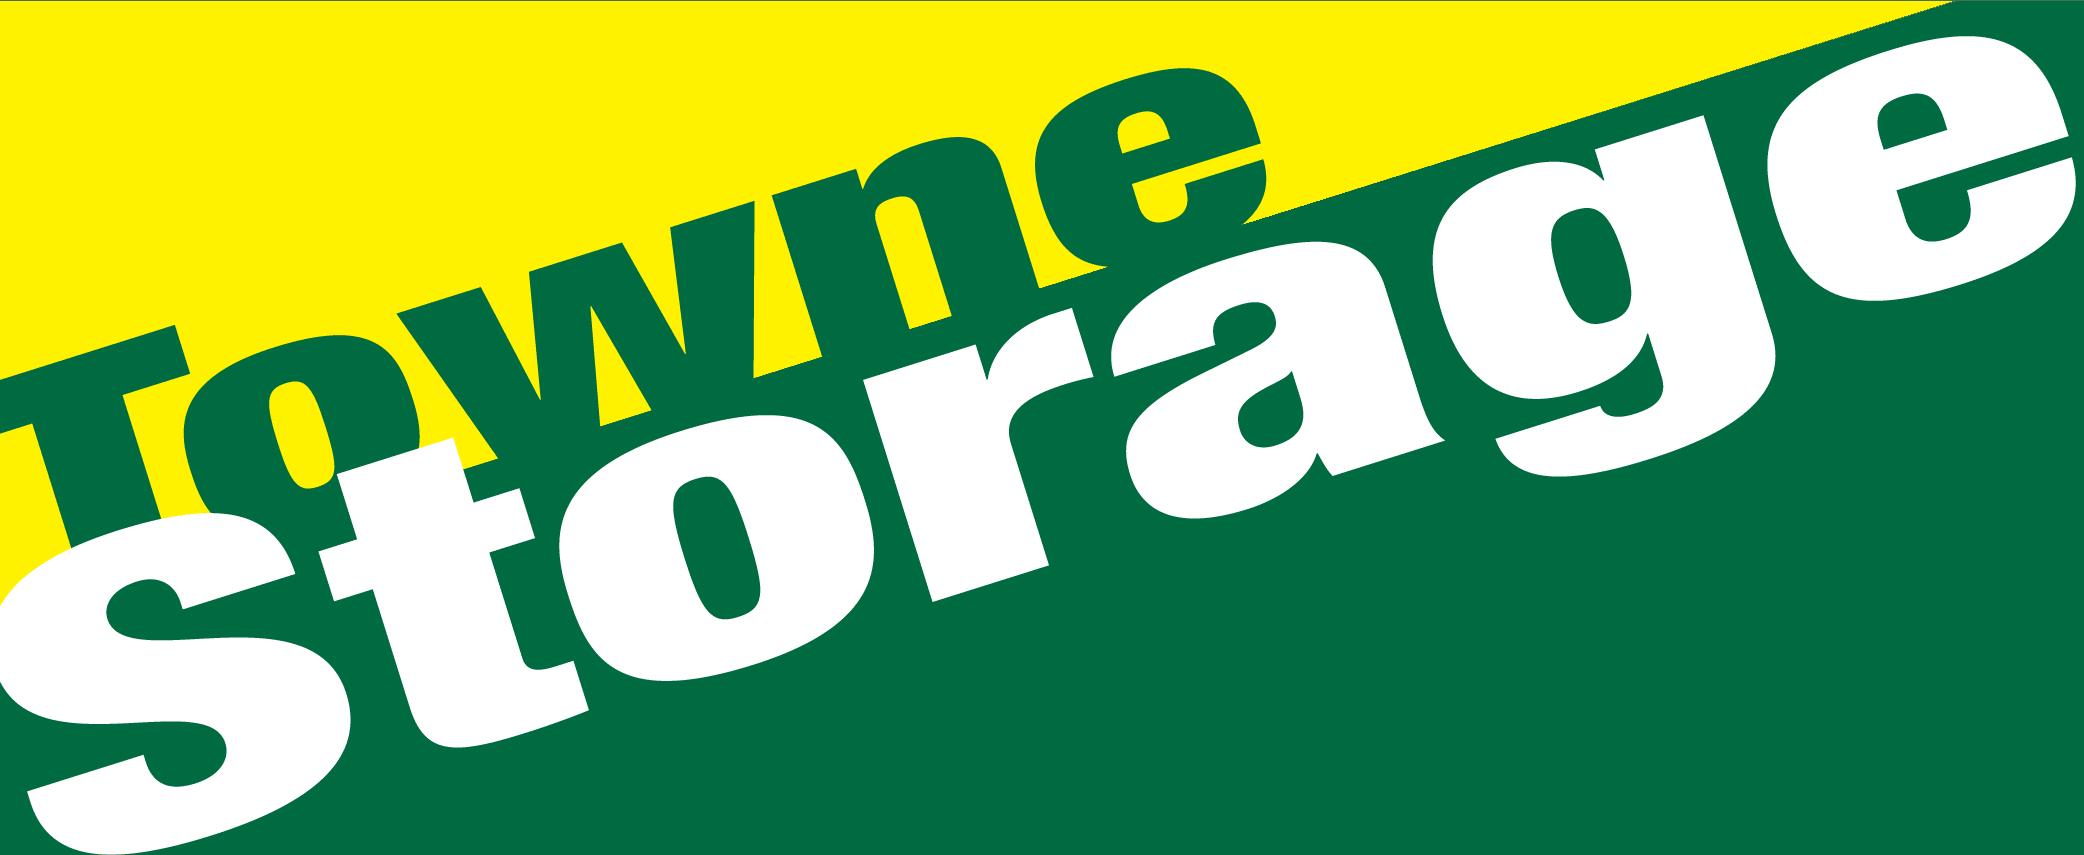 Towne Storage - Buffalo logo